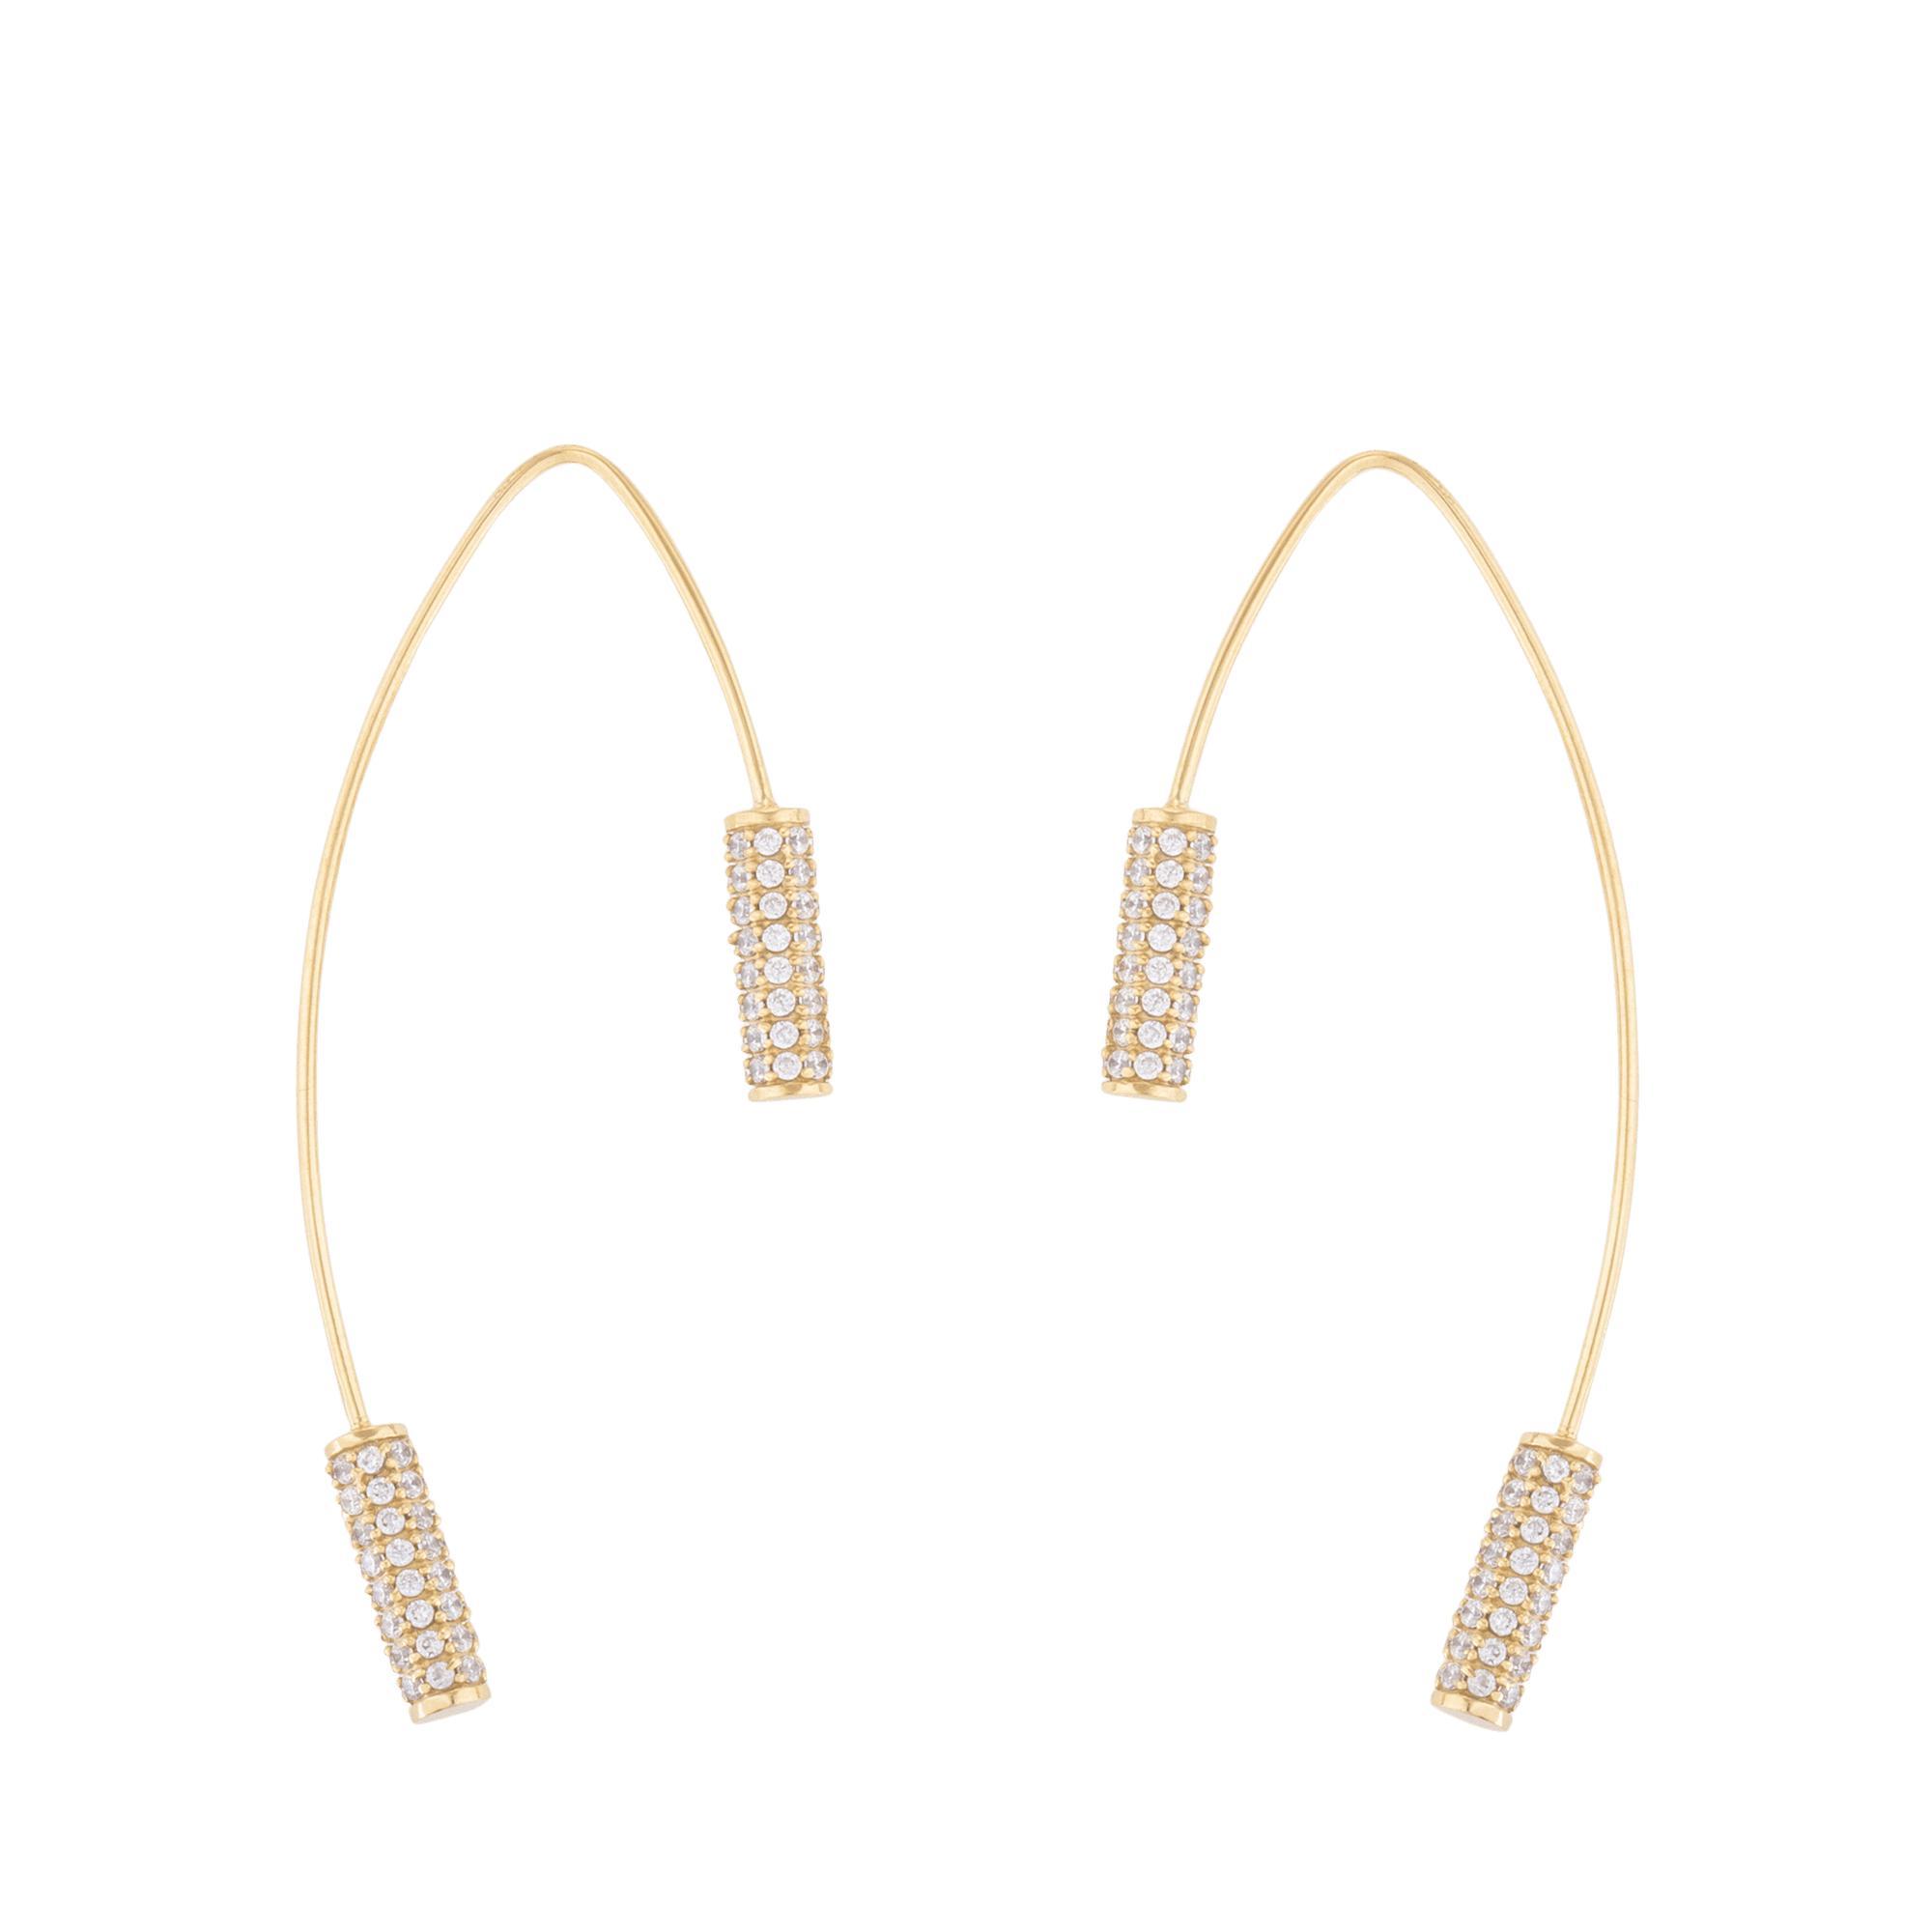 Joanna Laura Constantine Link Pave Stud Earrings mfuN7L1kwc